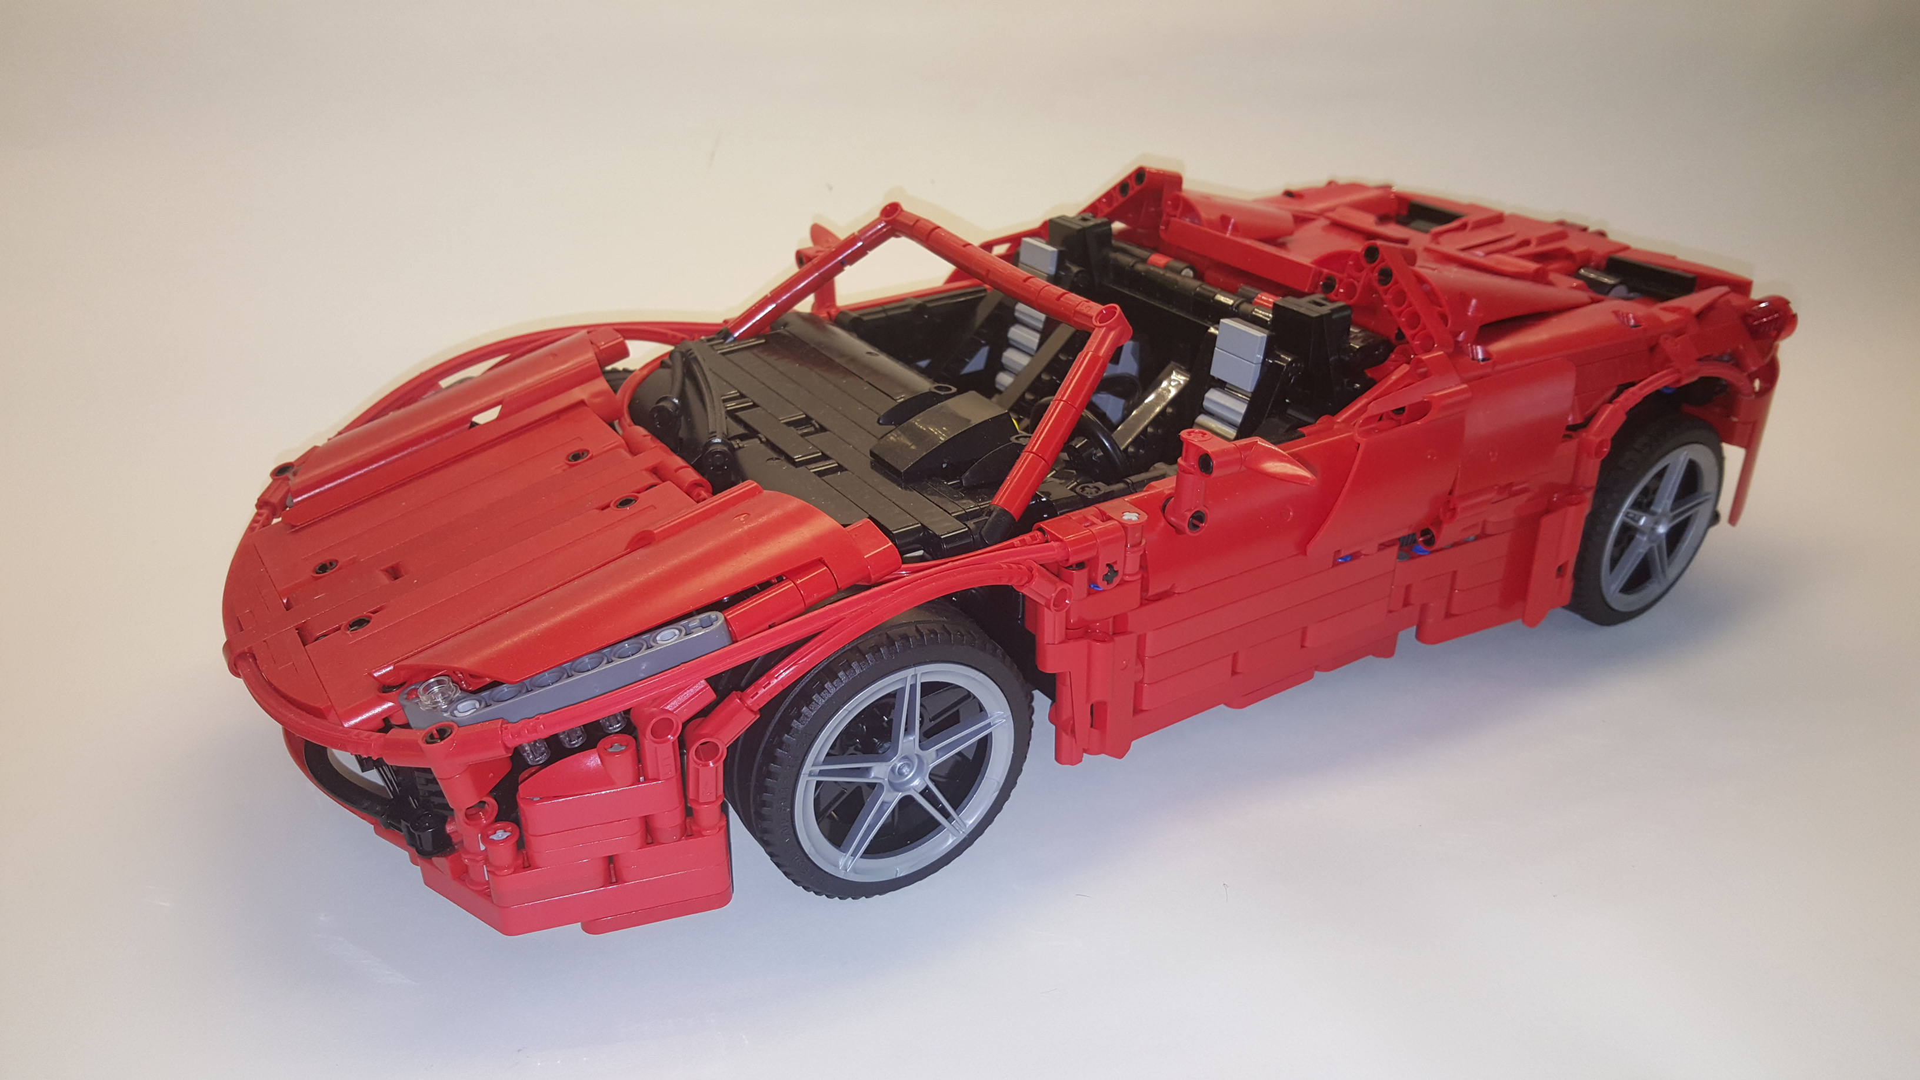 Lego Moc 1767 Red Spider Technic 2014 Rebrickable